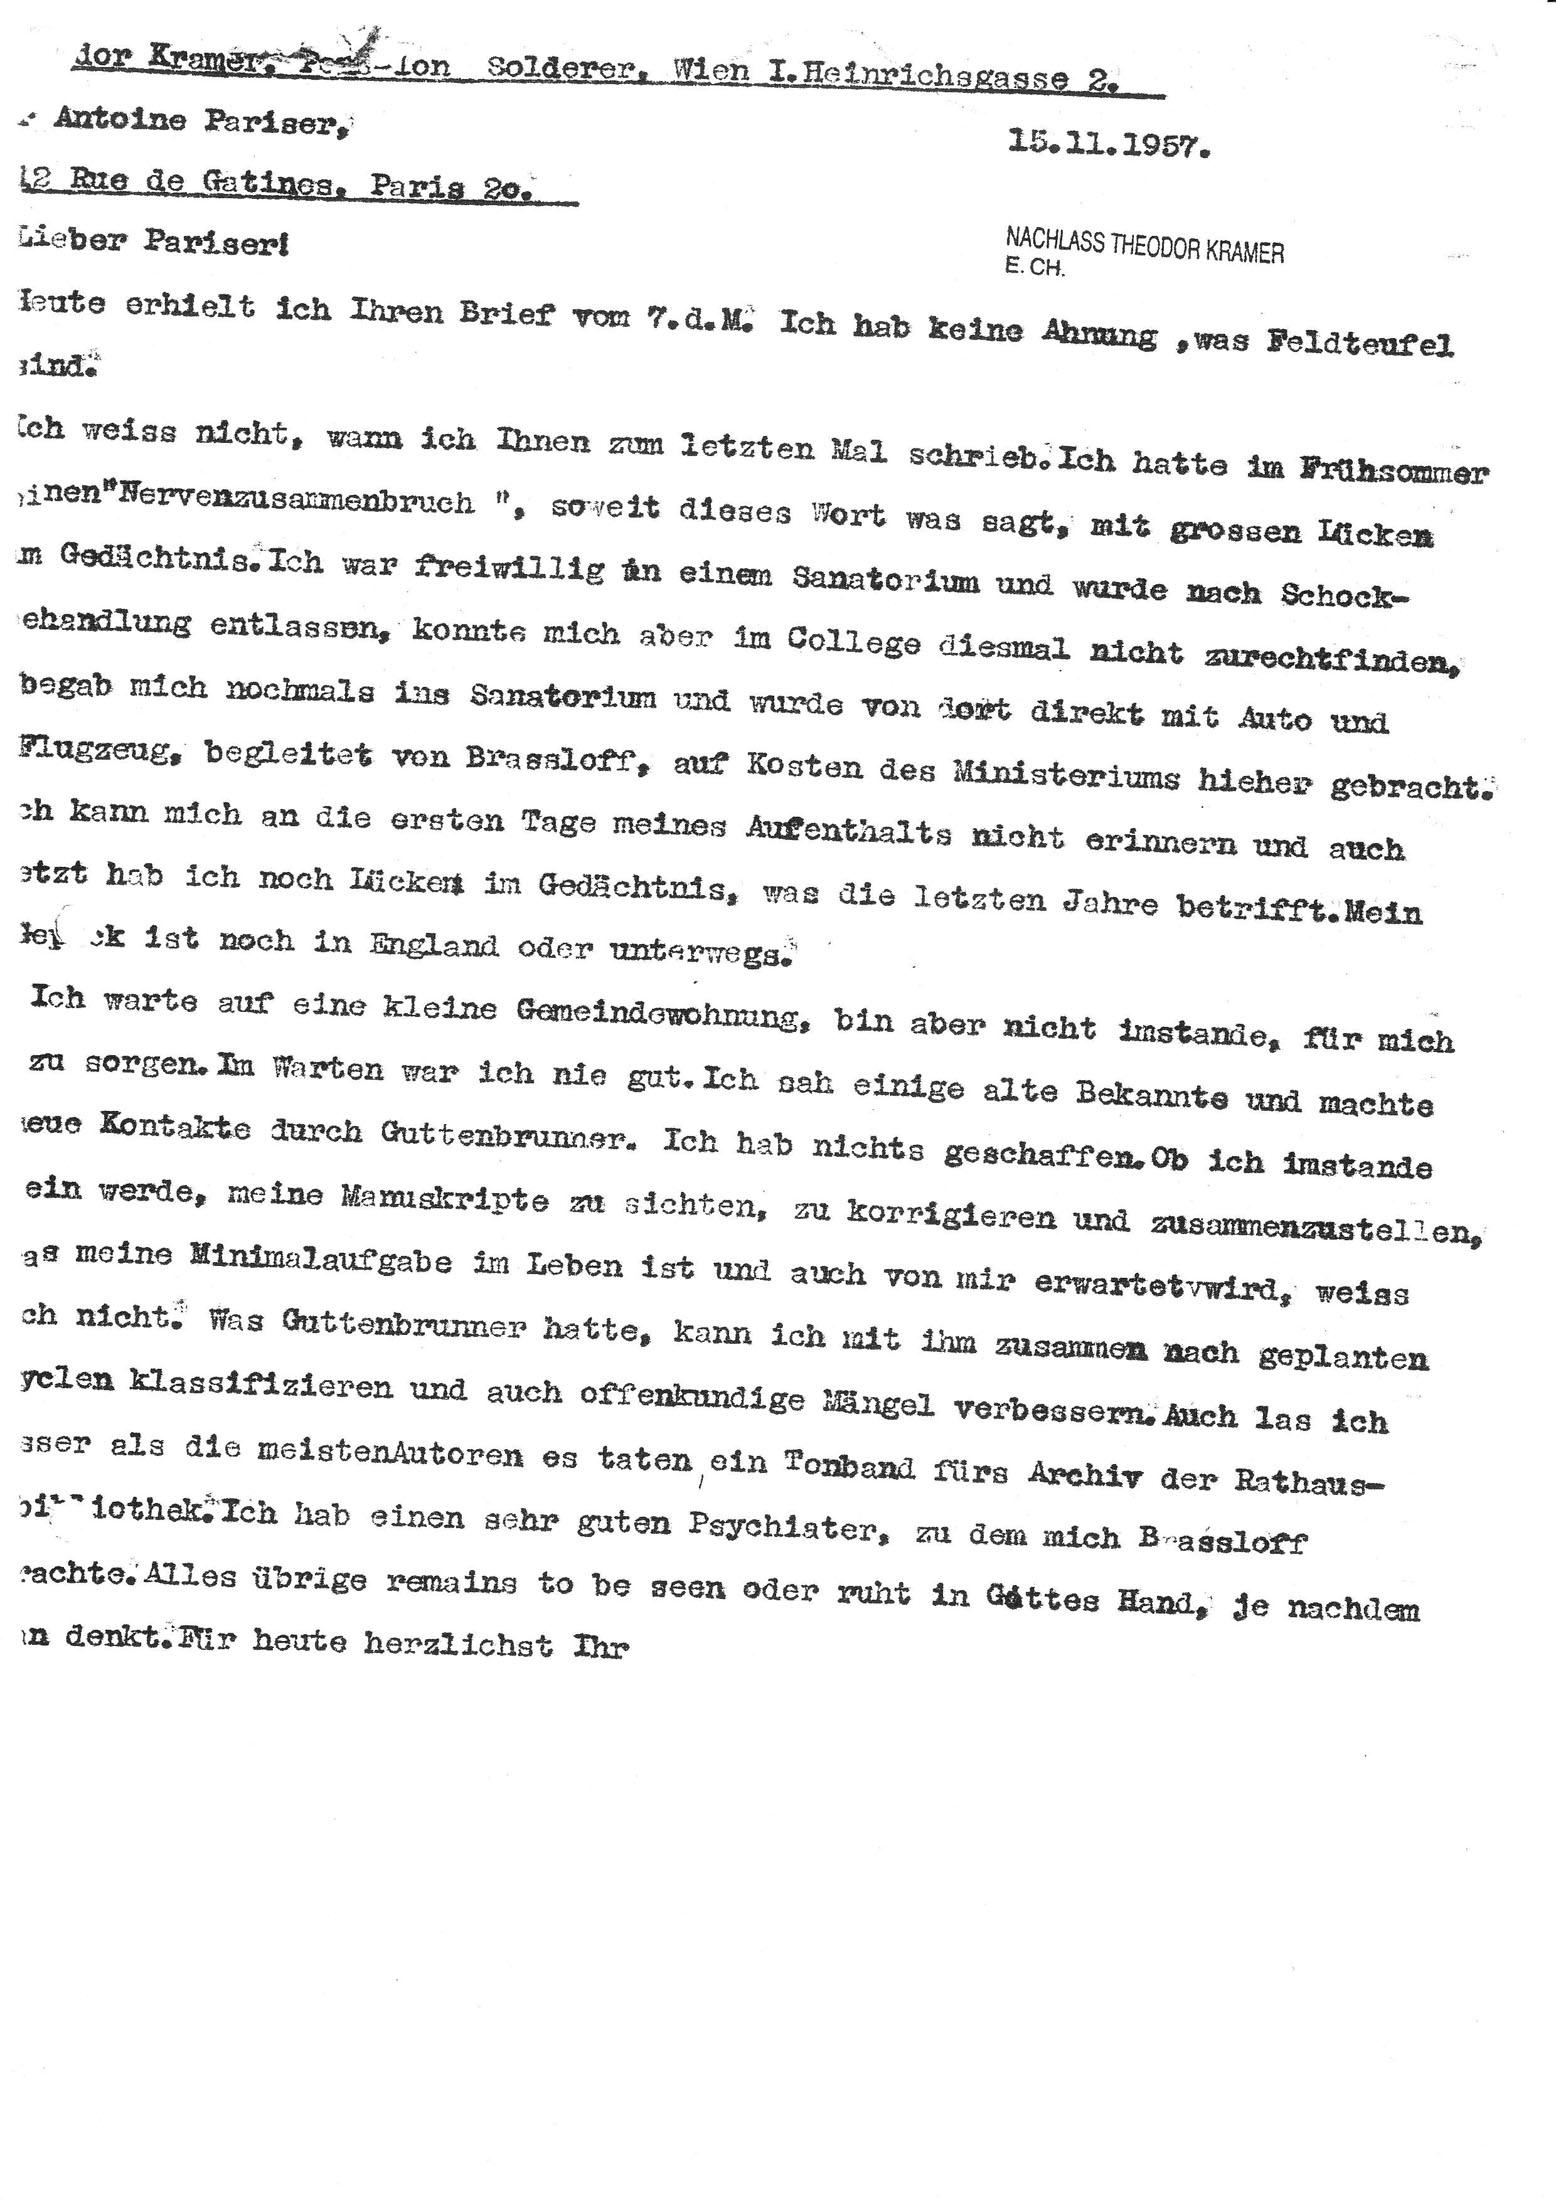 Theodor Kramer Gesellschaft Herbert Exenberger Archiv Dr Anton